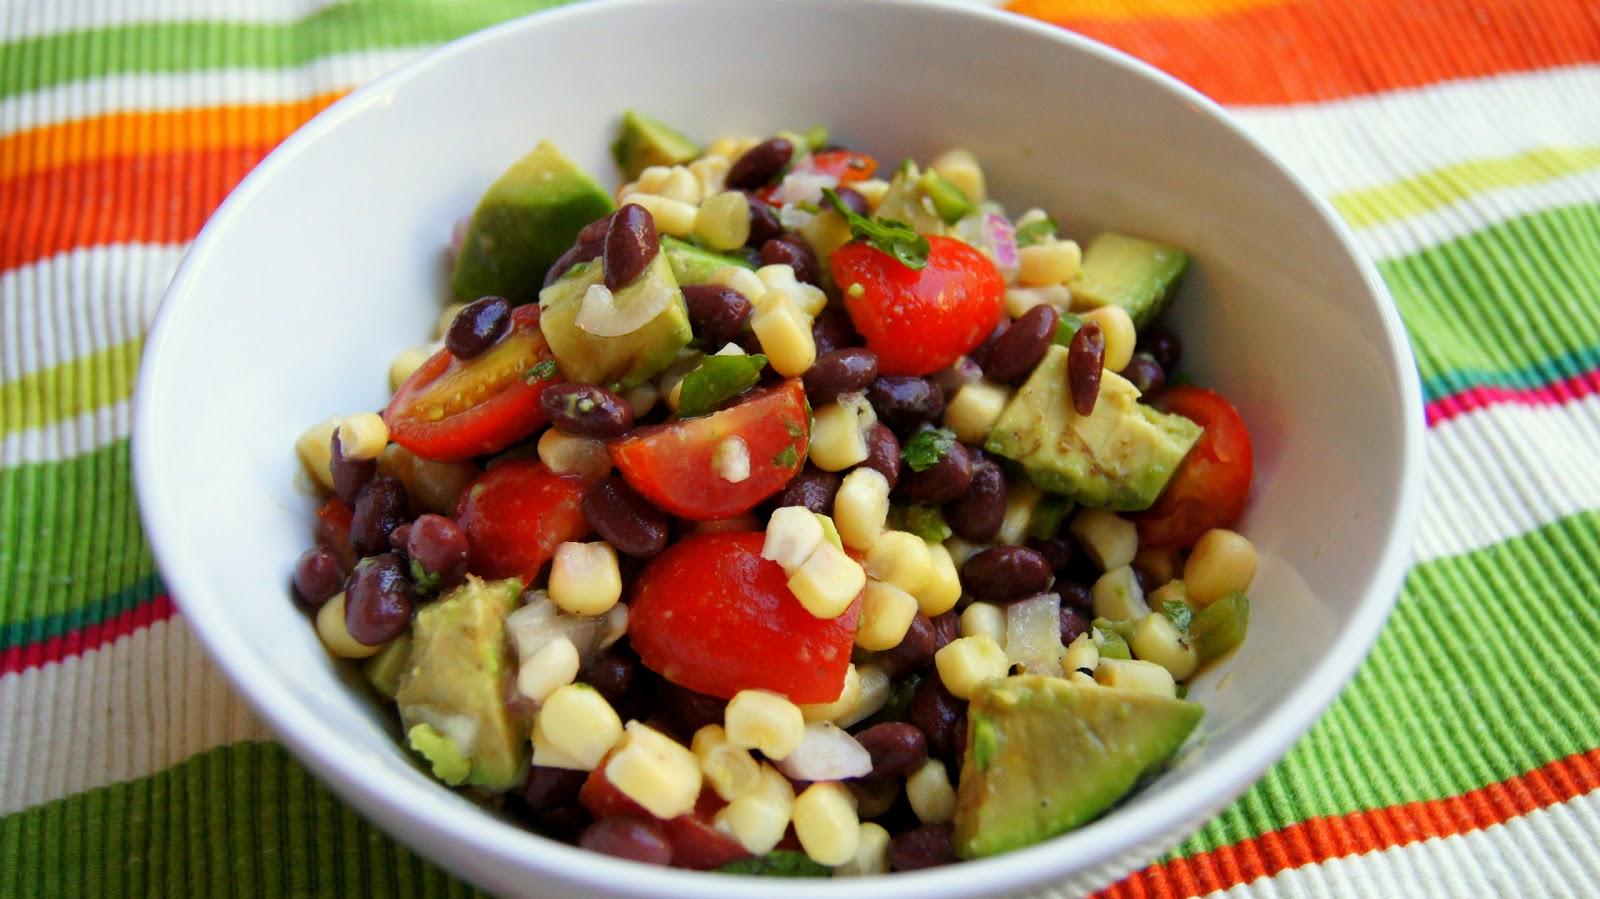 ... Dutch Oven: Southwestern Black Bean, Corn, Tomato, and Avocado Salad